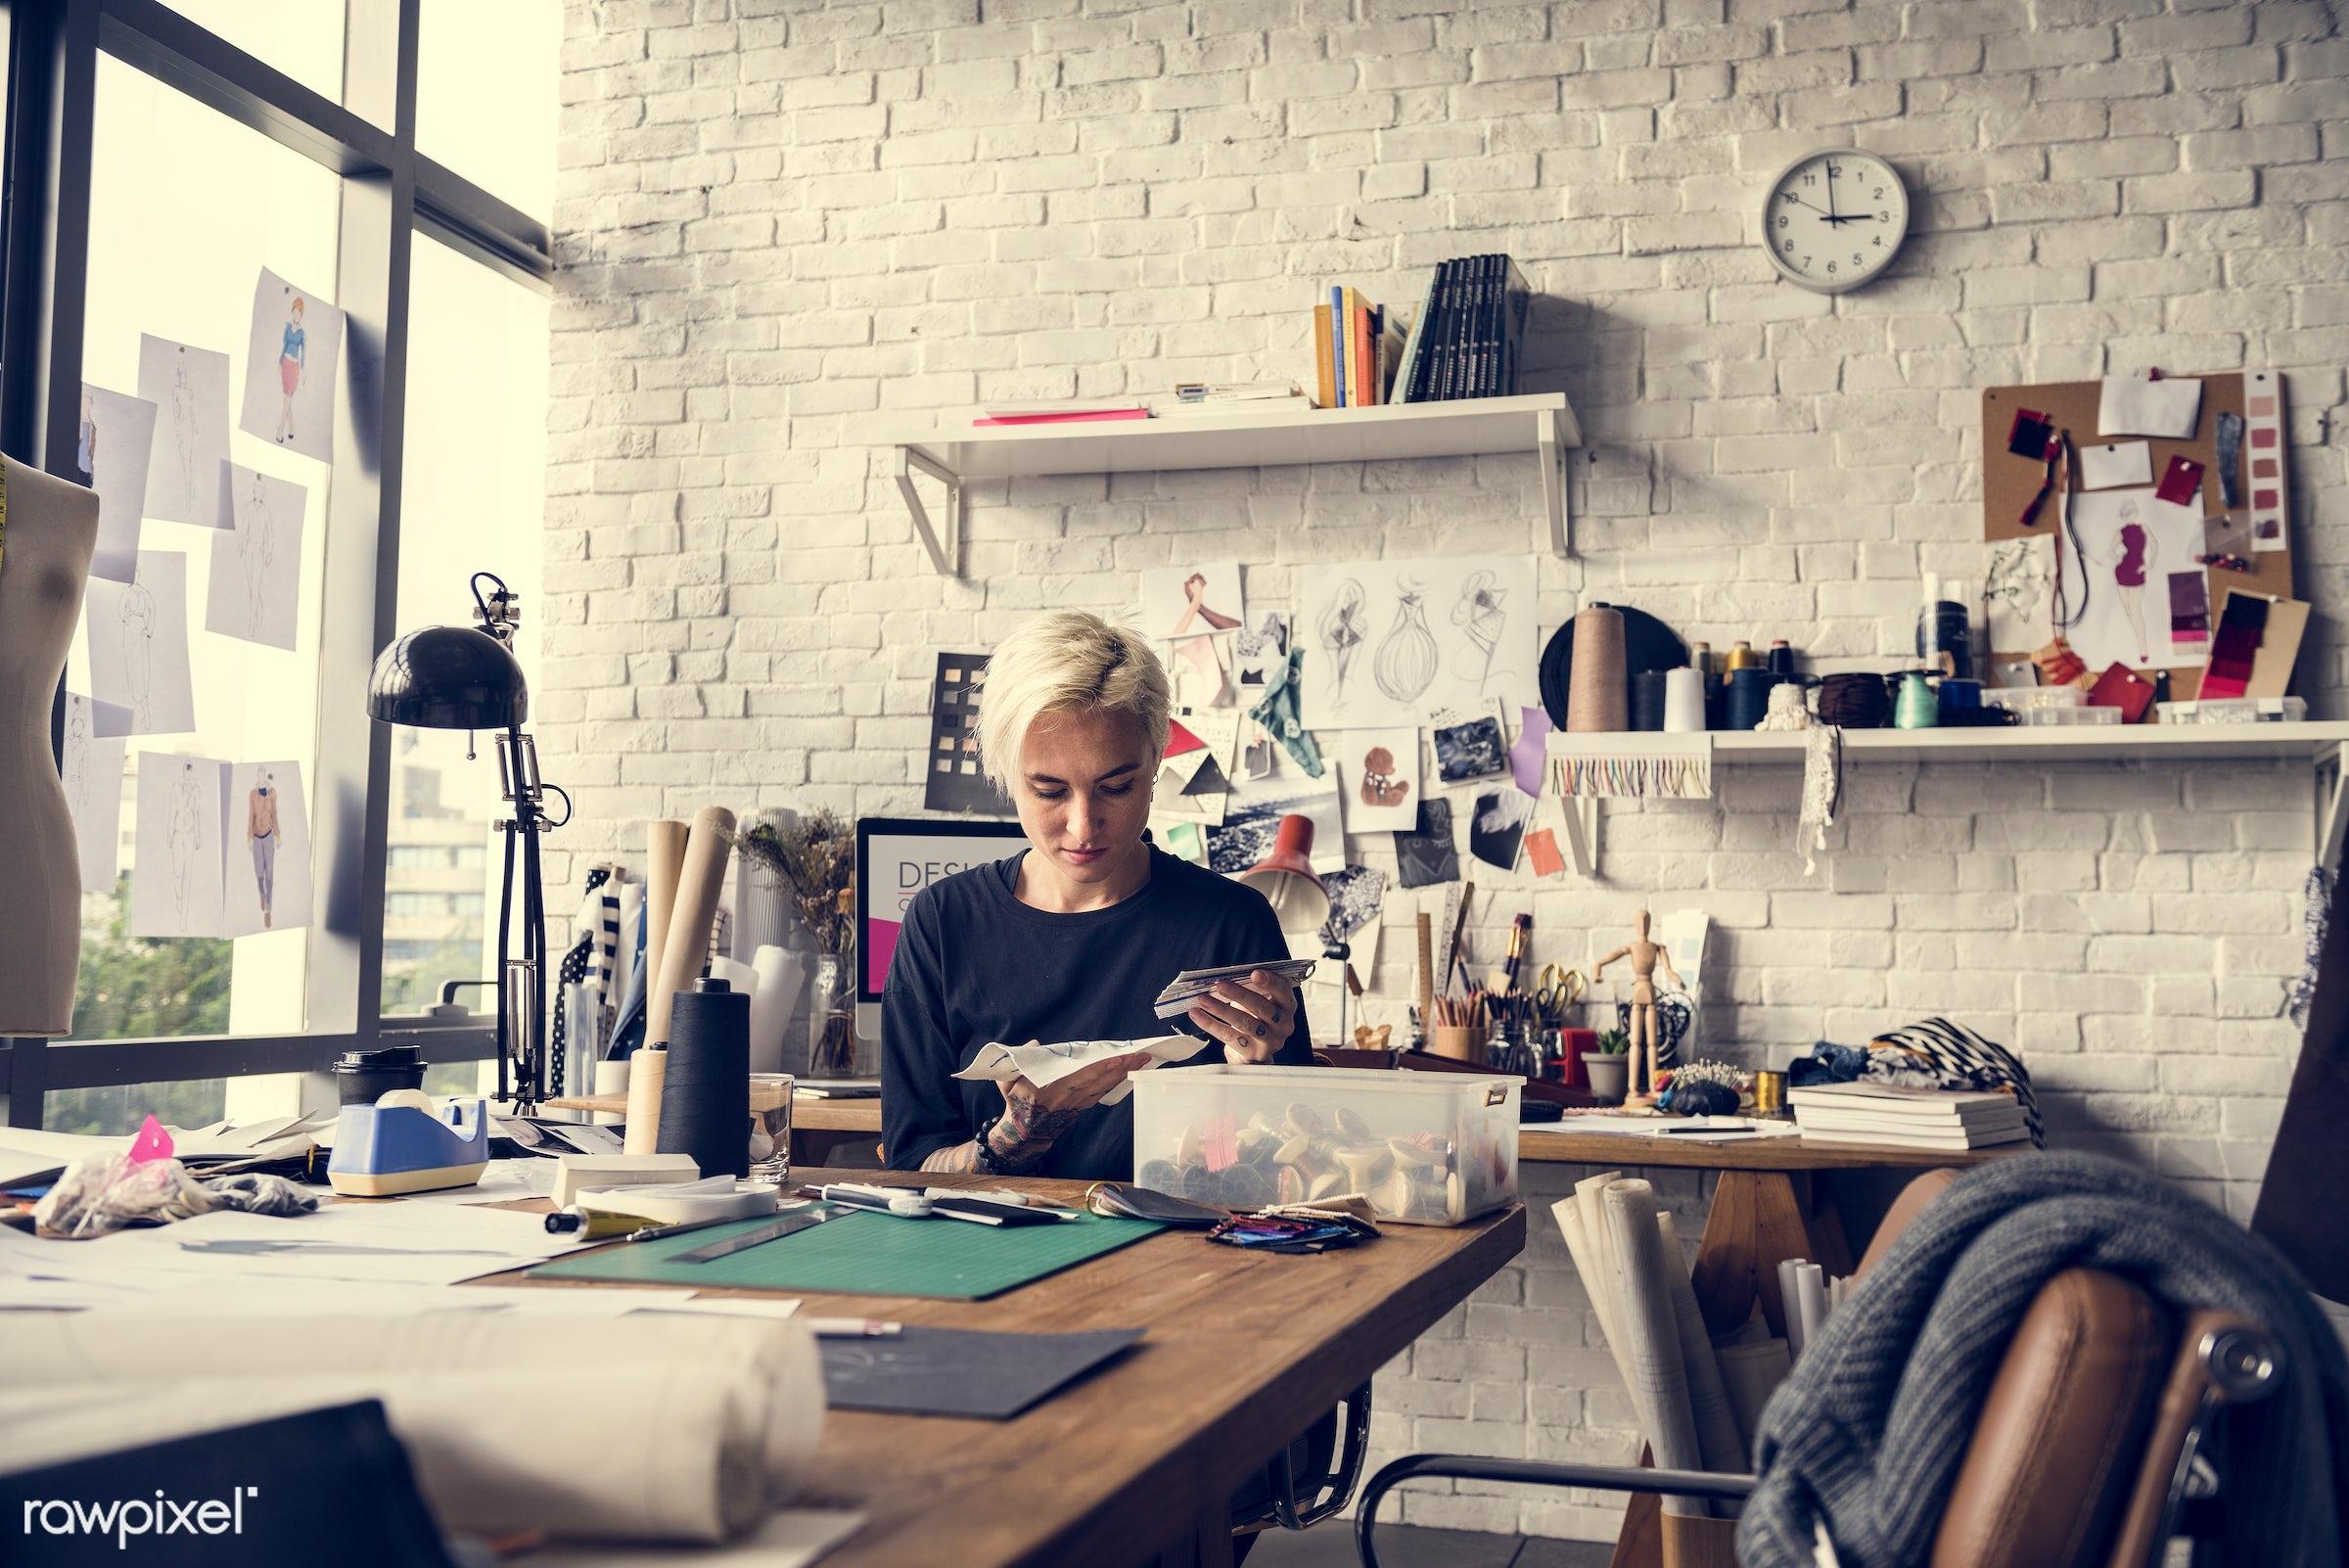 studio, fashion, craft, measure, clothing, handicraft, dressmaker, trendy, stylist, creativity, style, cloth, stylish,...